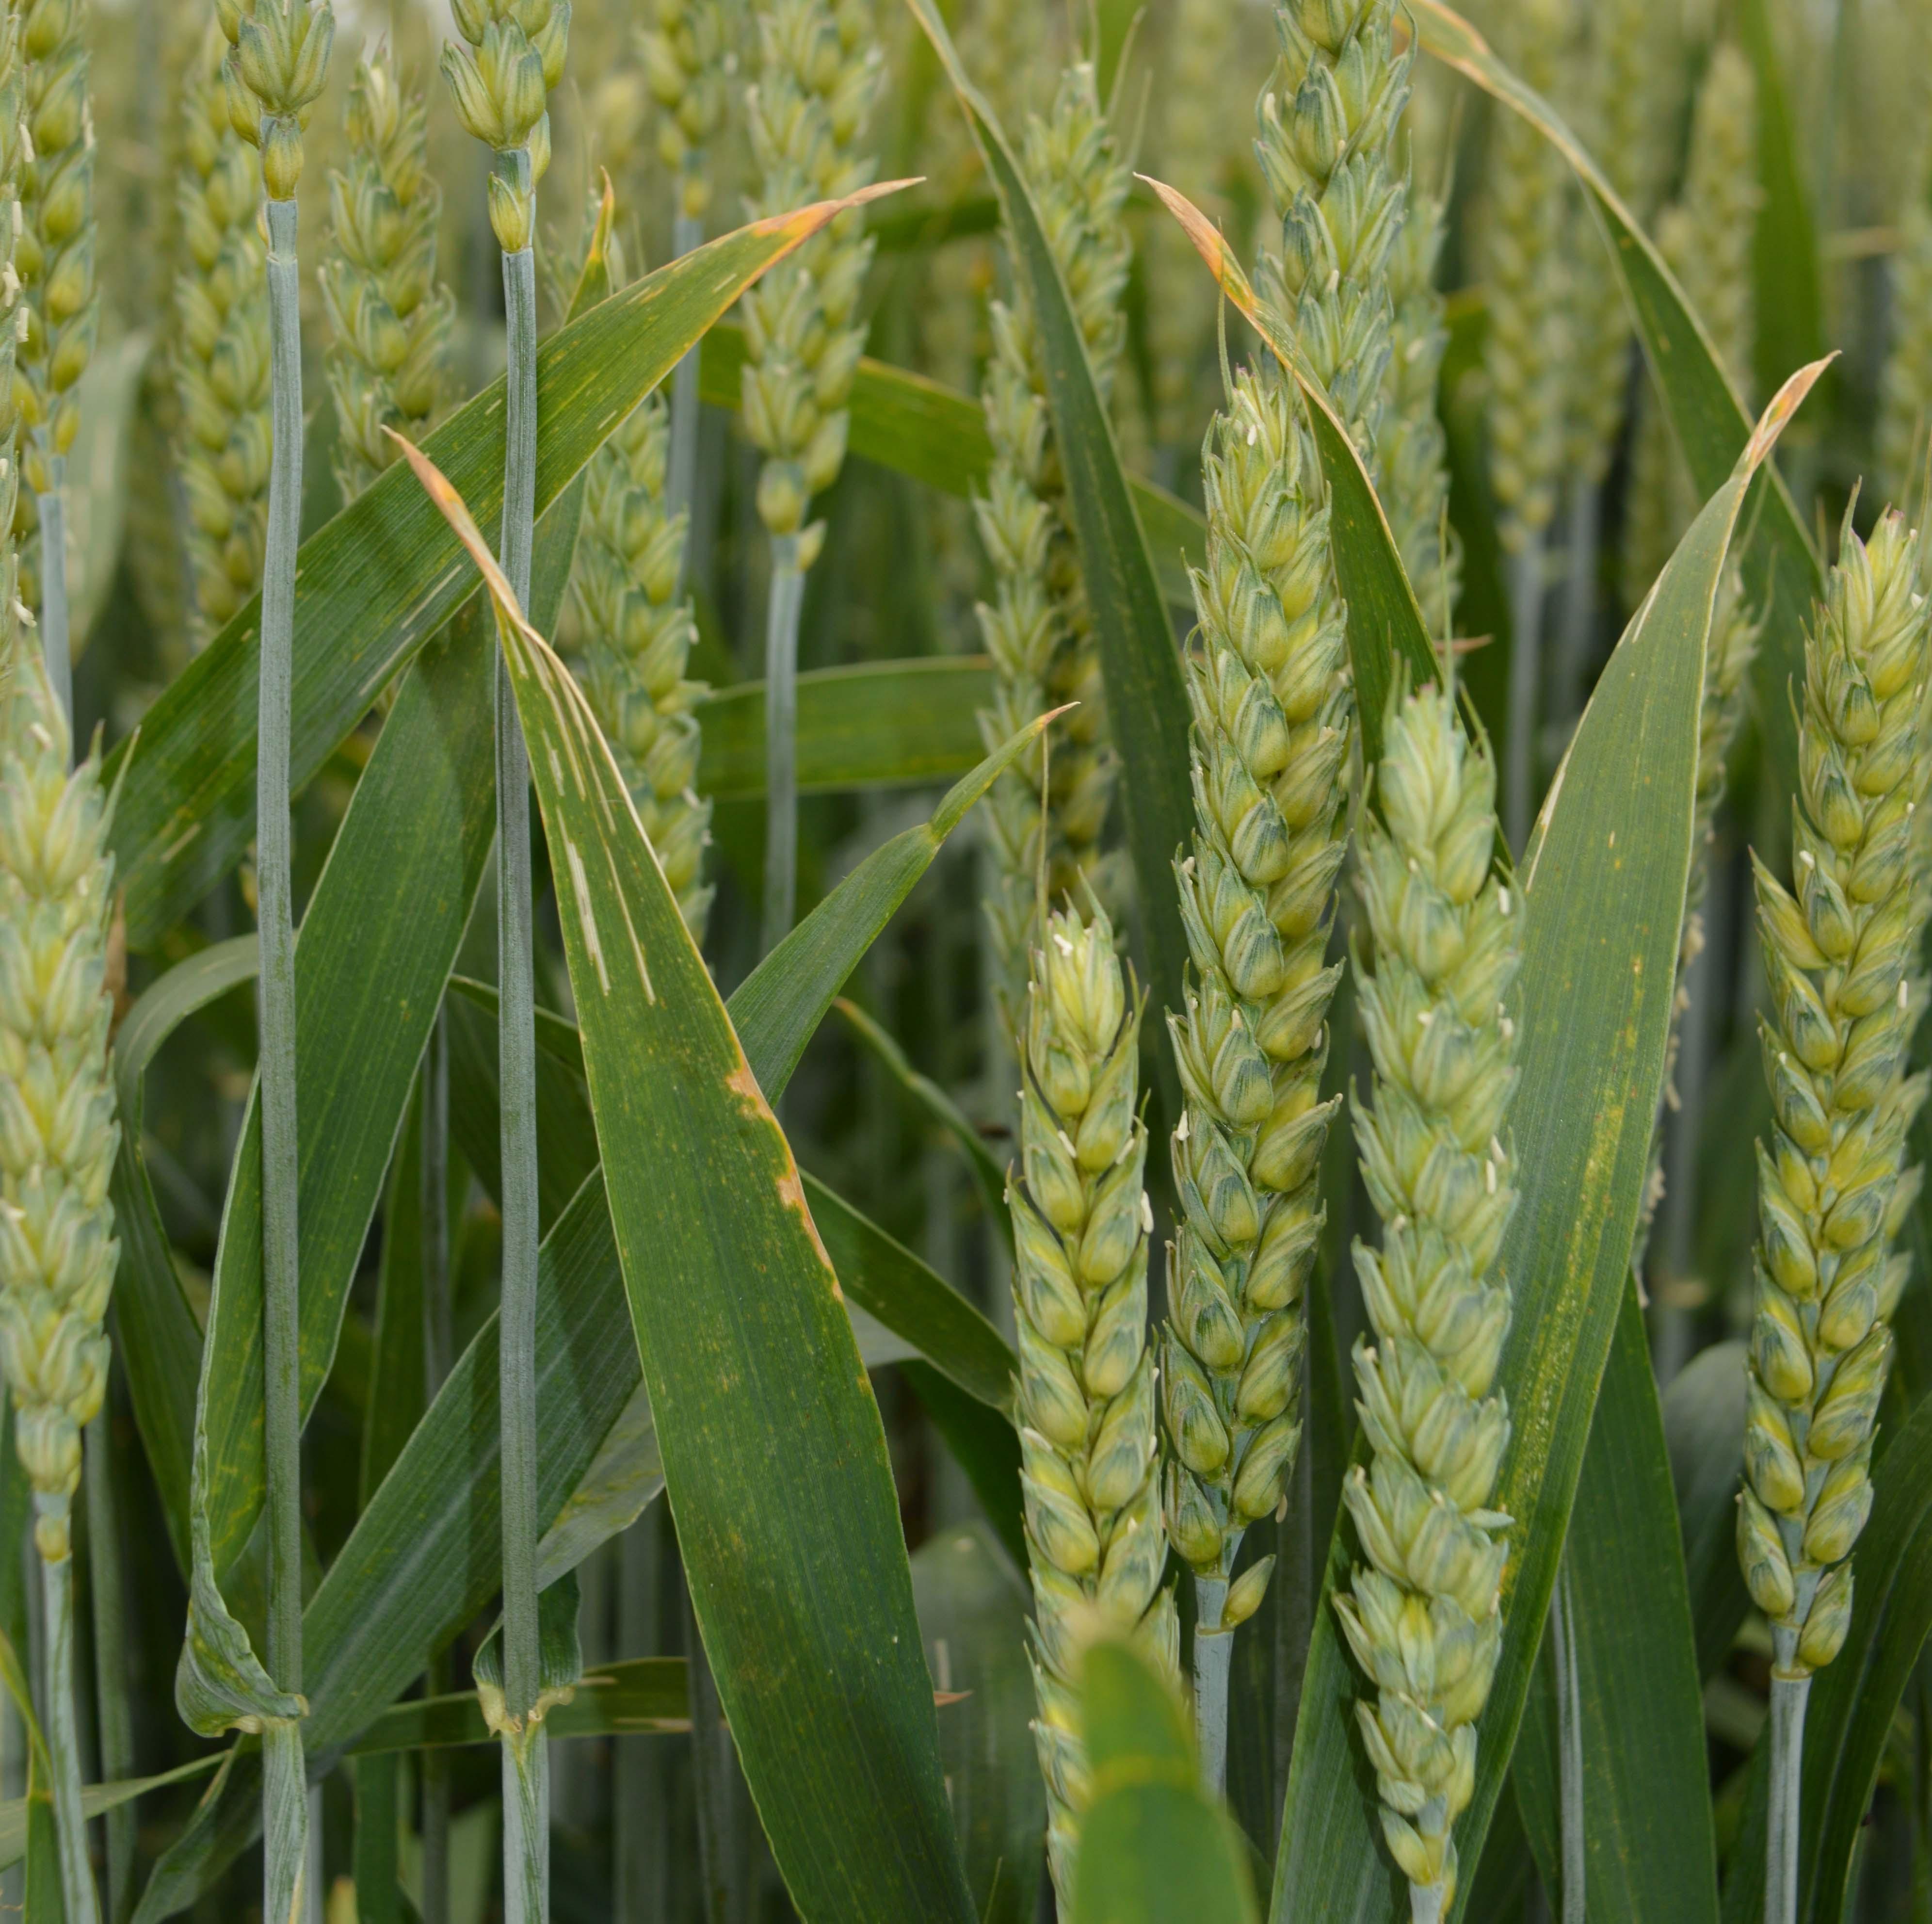 Wheat grain wedding